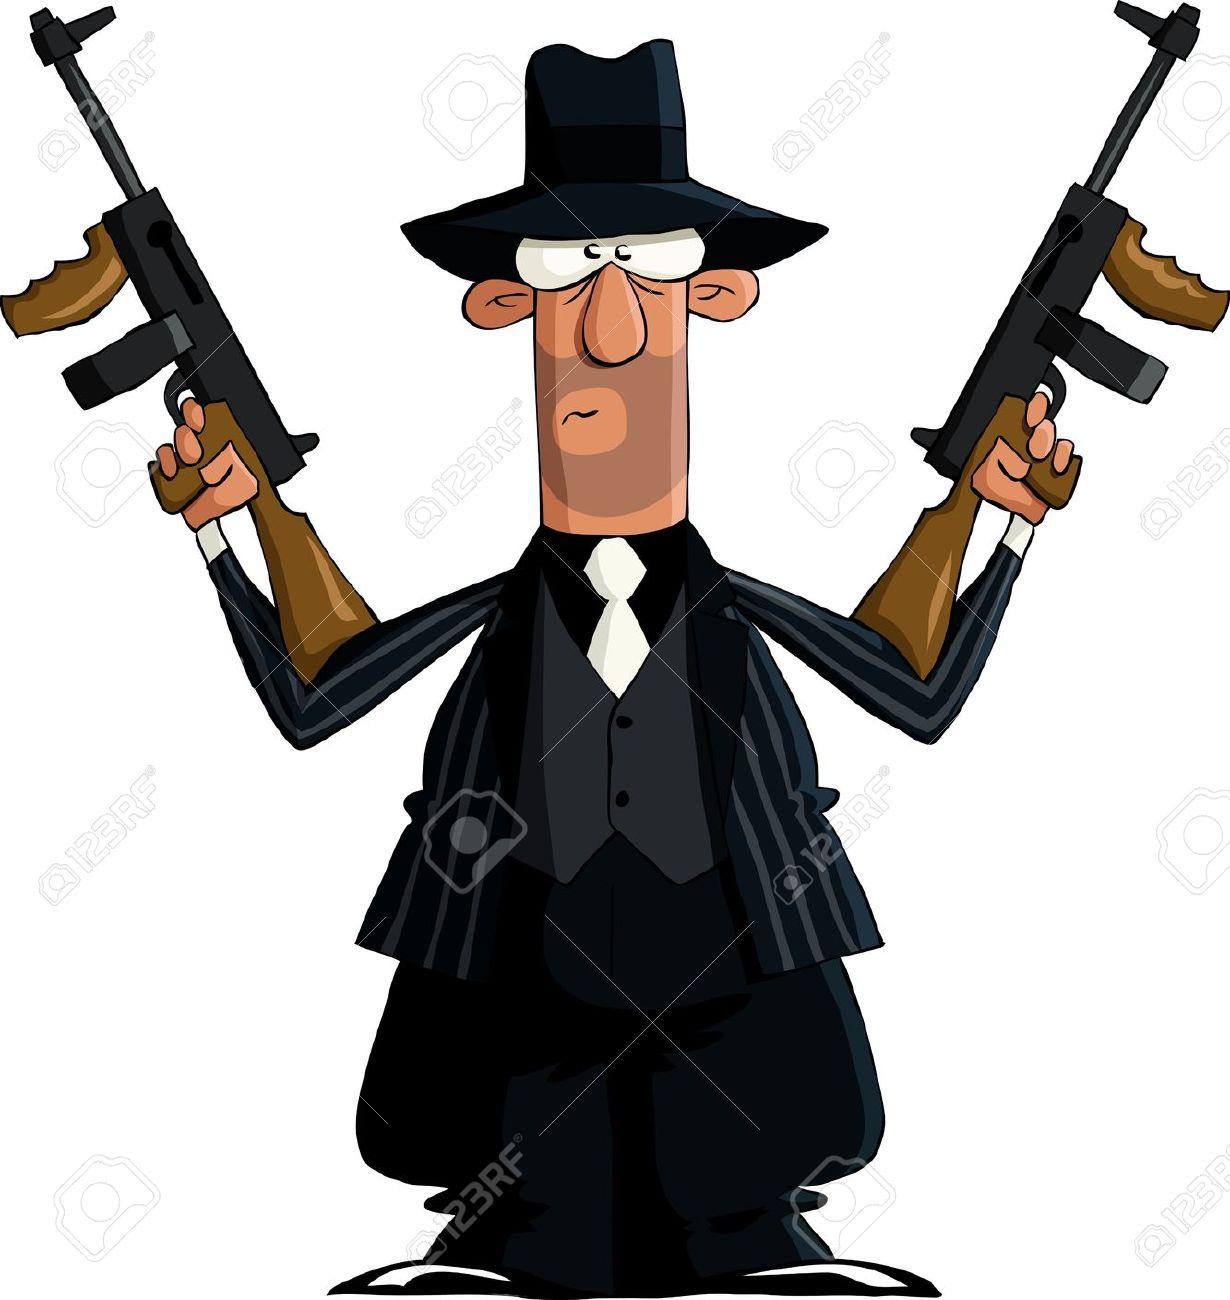 Mafia gangster clipart.